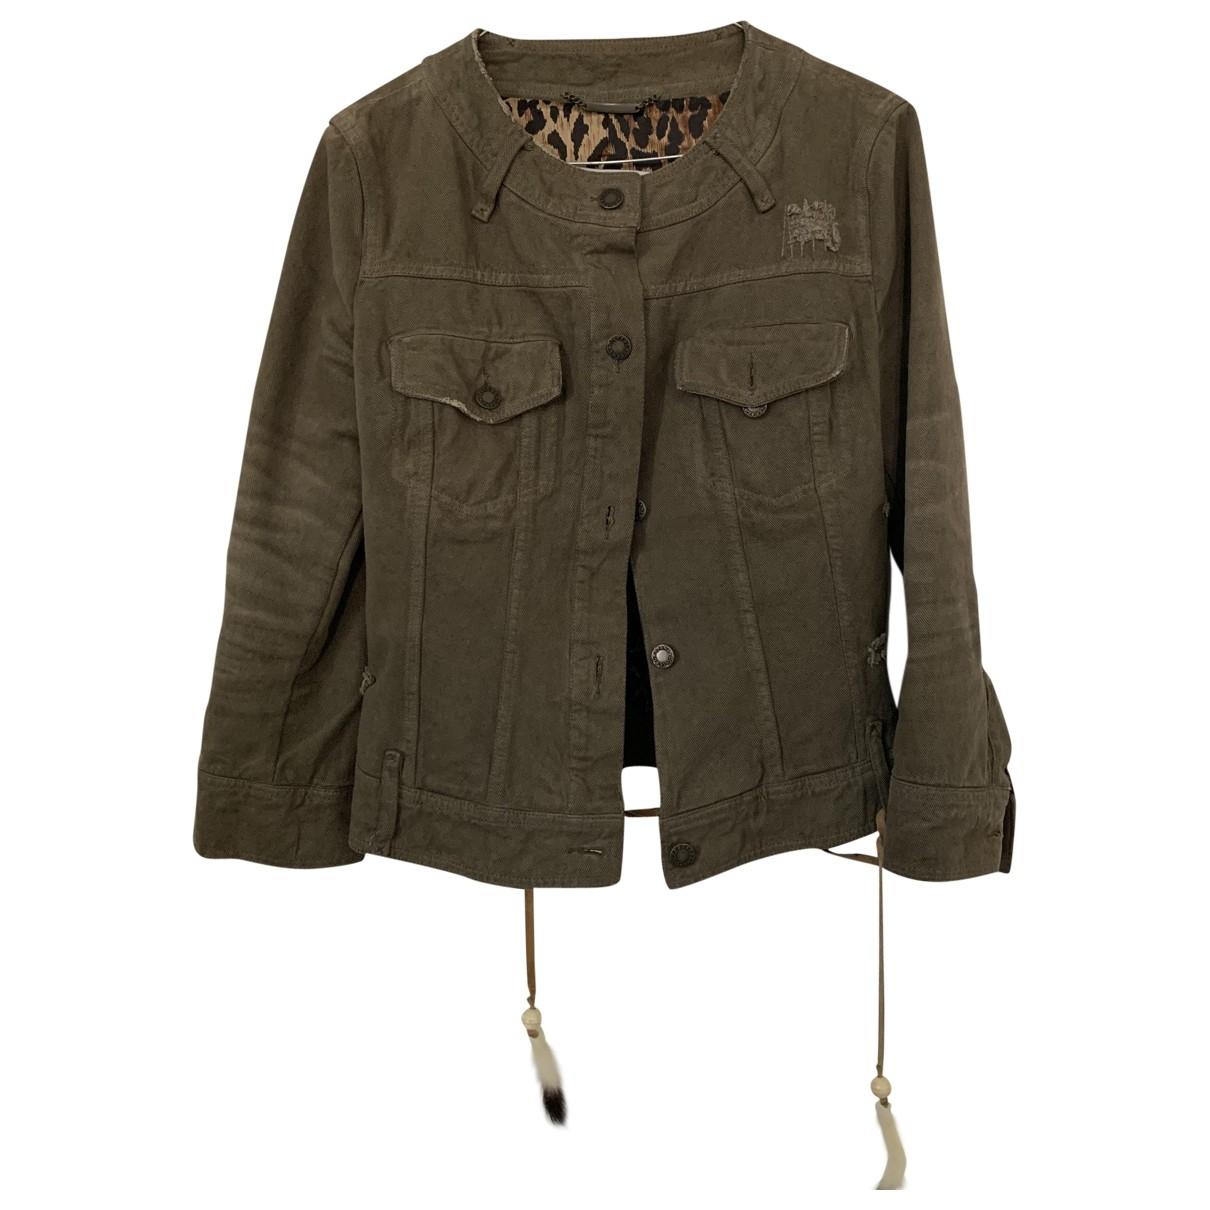 Dolce & Gabbana \N Jacke in  Khaki Denim - Jeans